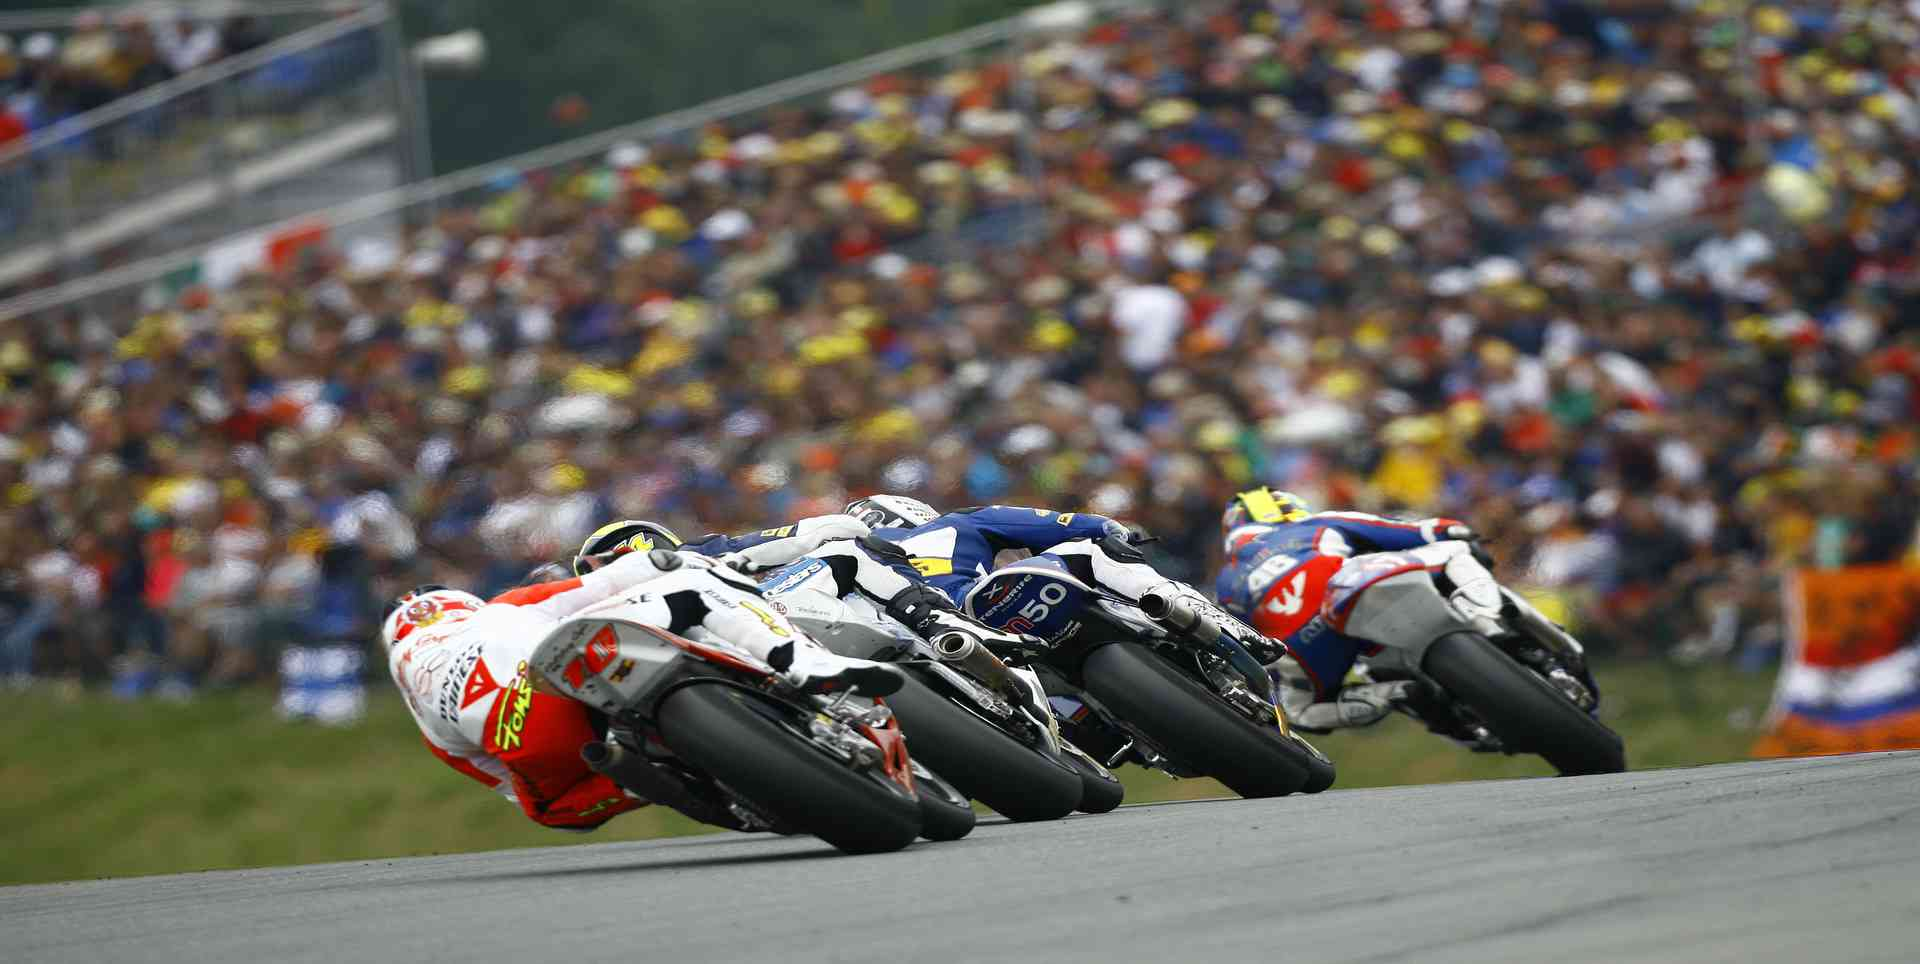 Superbike FIM World Championship